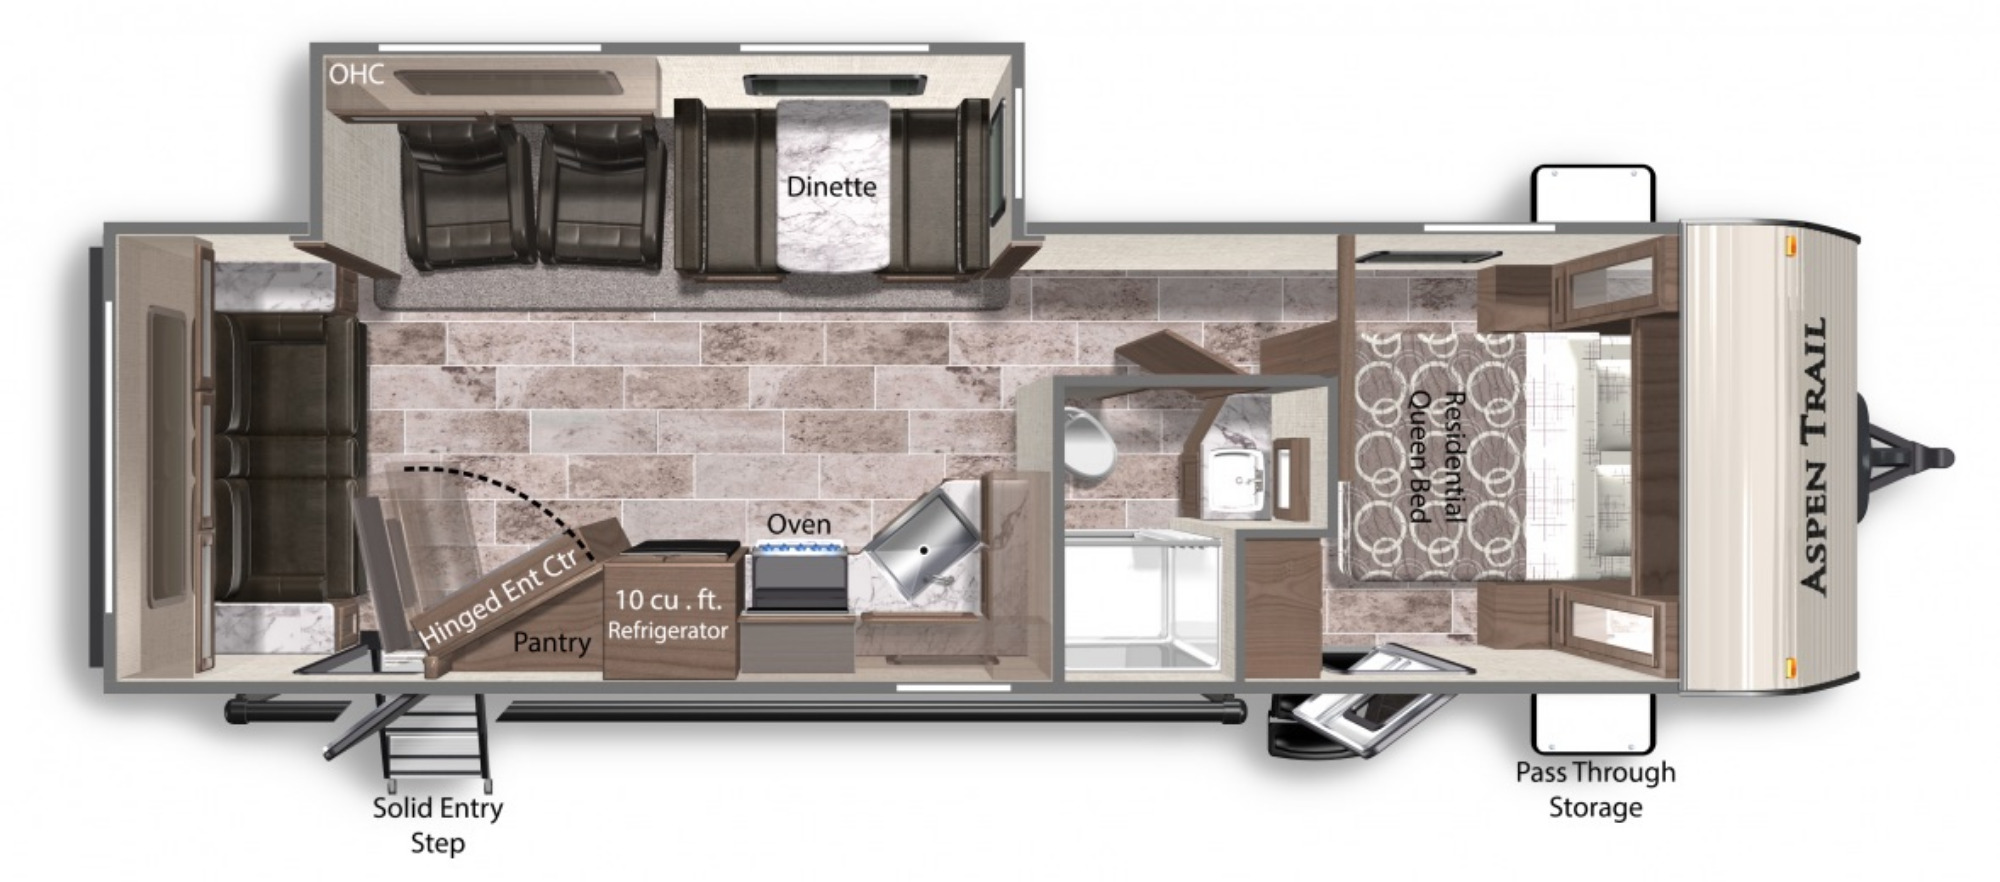 View Floor Plan for 2021 DUTCHMEN ASPEN TRAIL 2860RLS